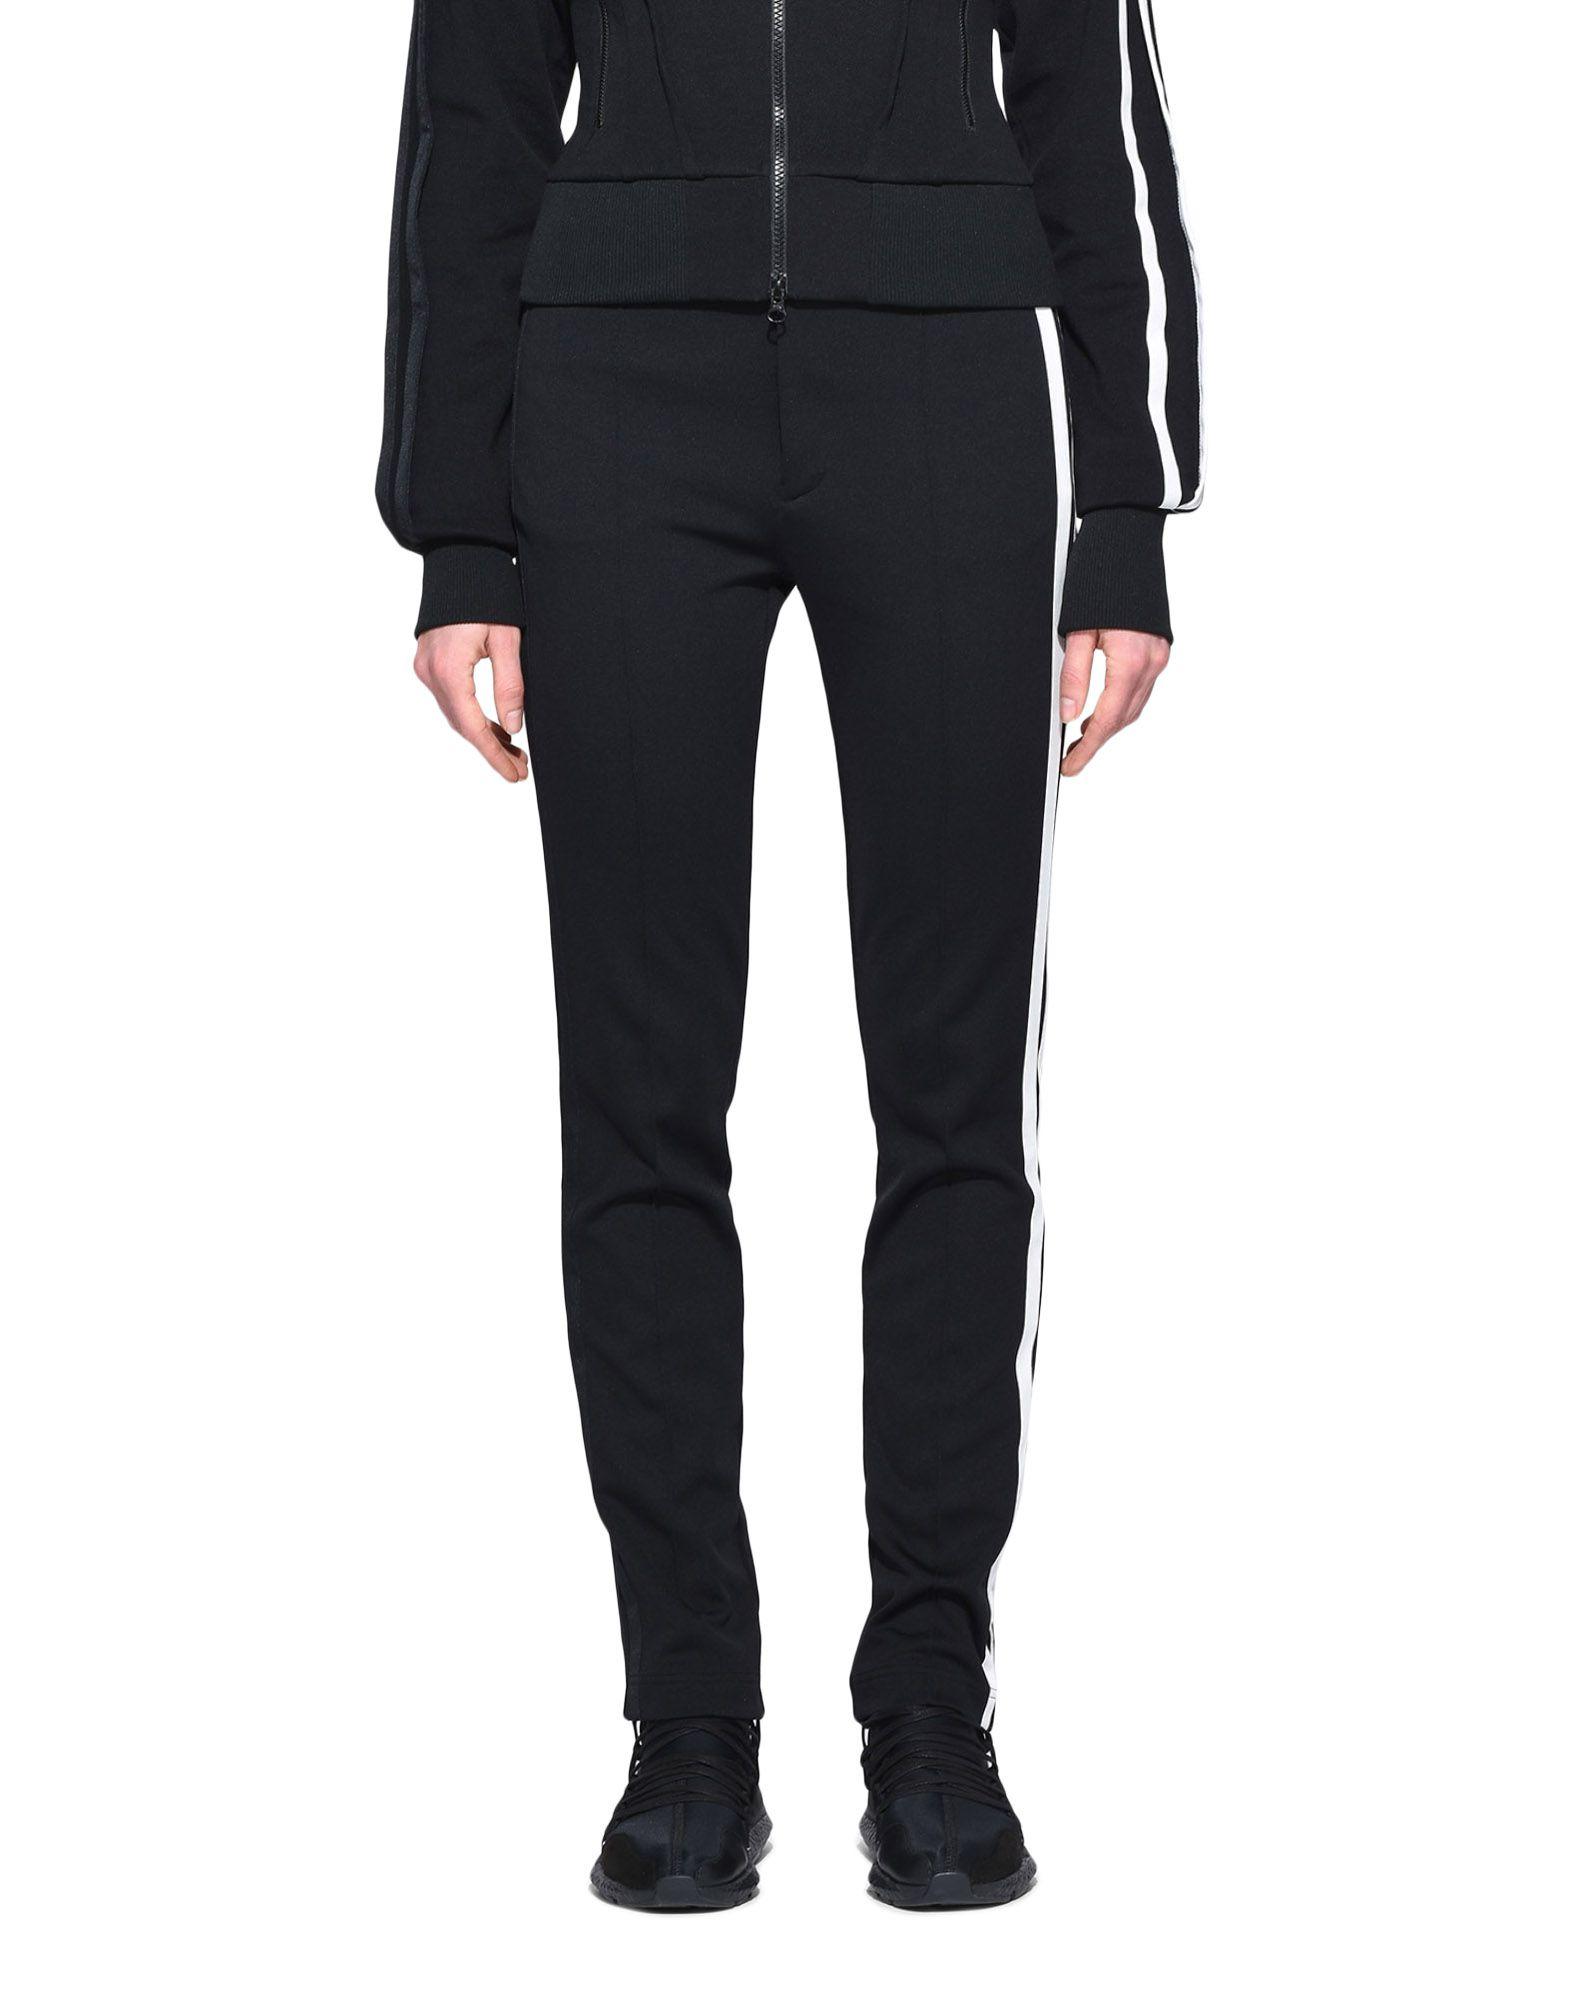 Y-3 Y-3 High Waist Matte Track Pants Casual pants Woman r